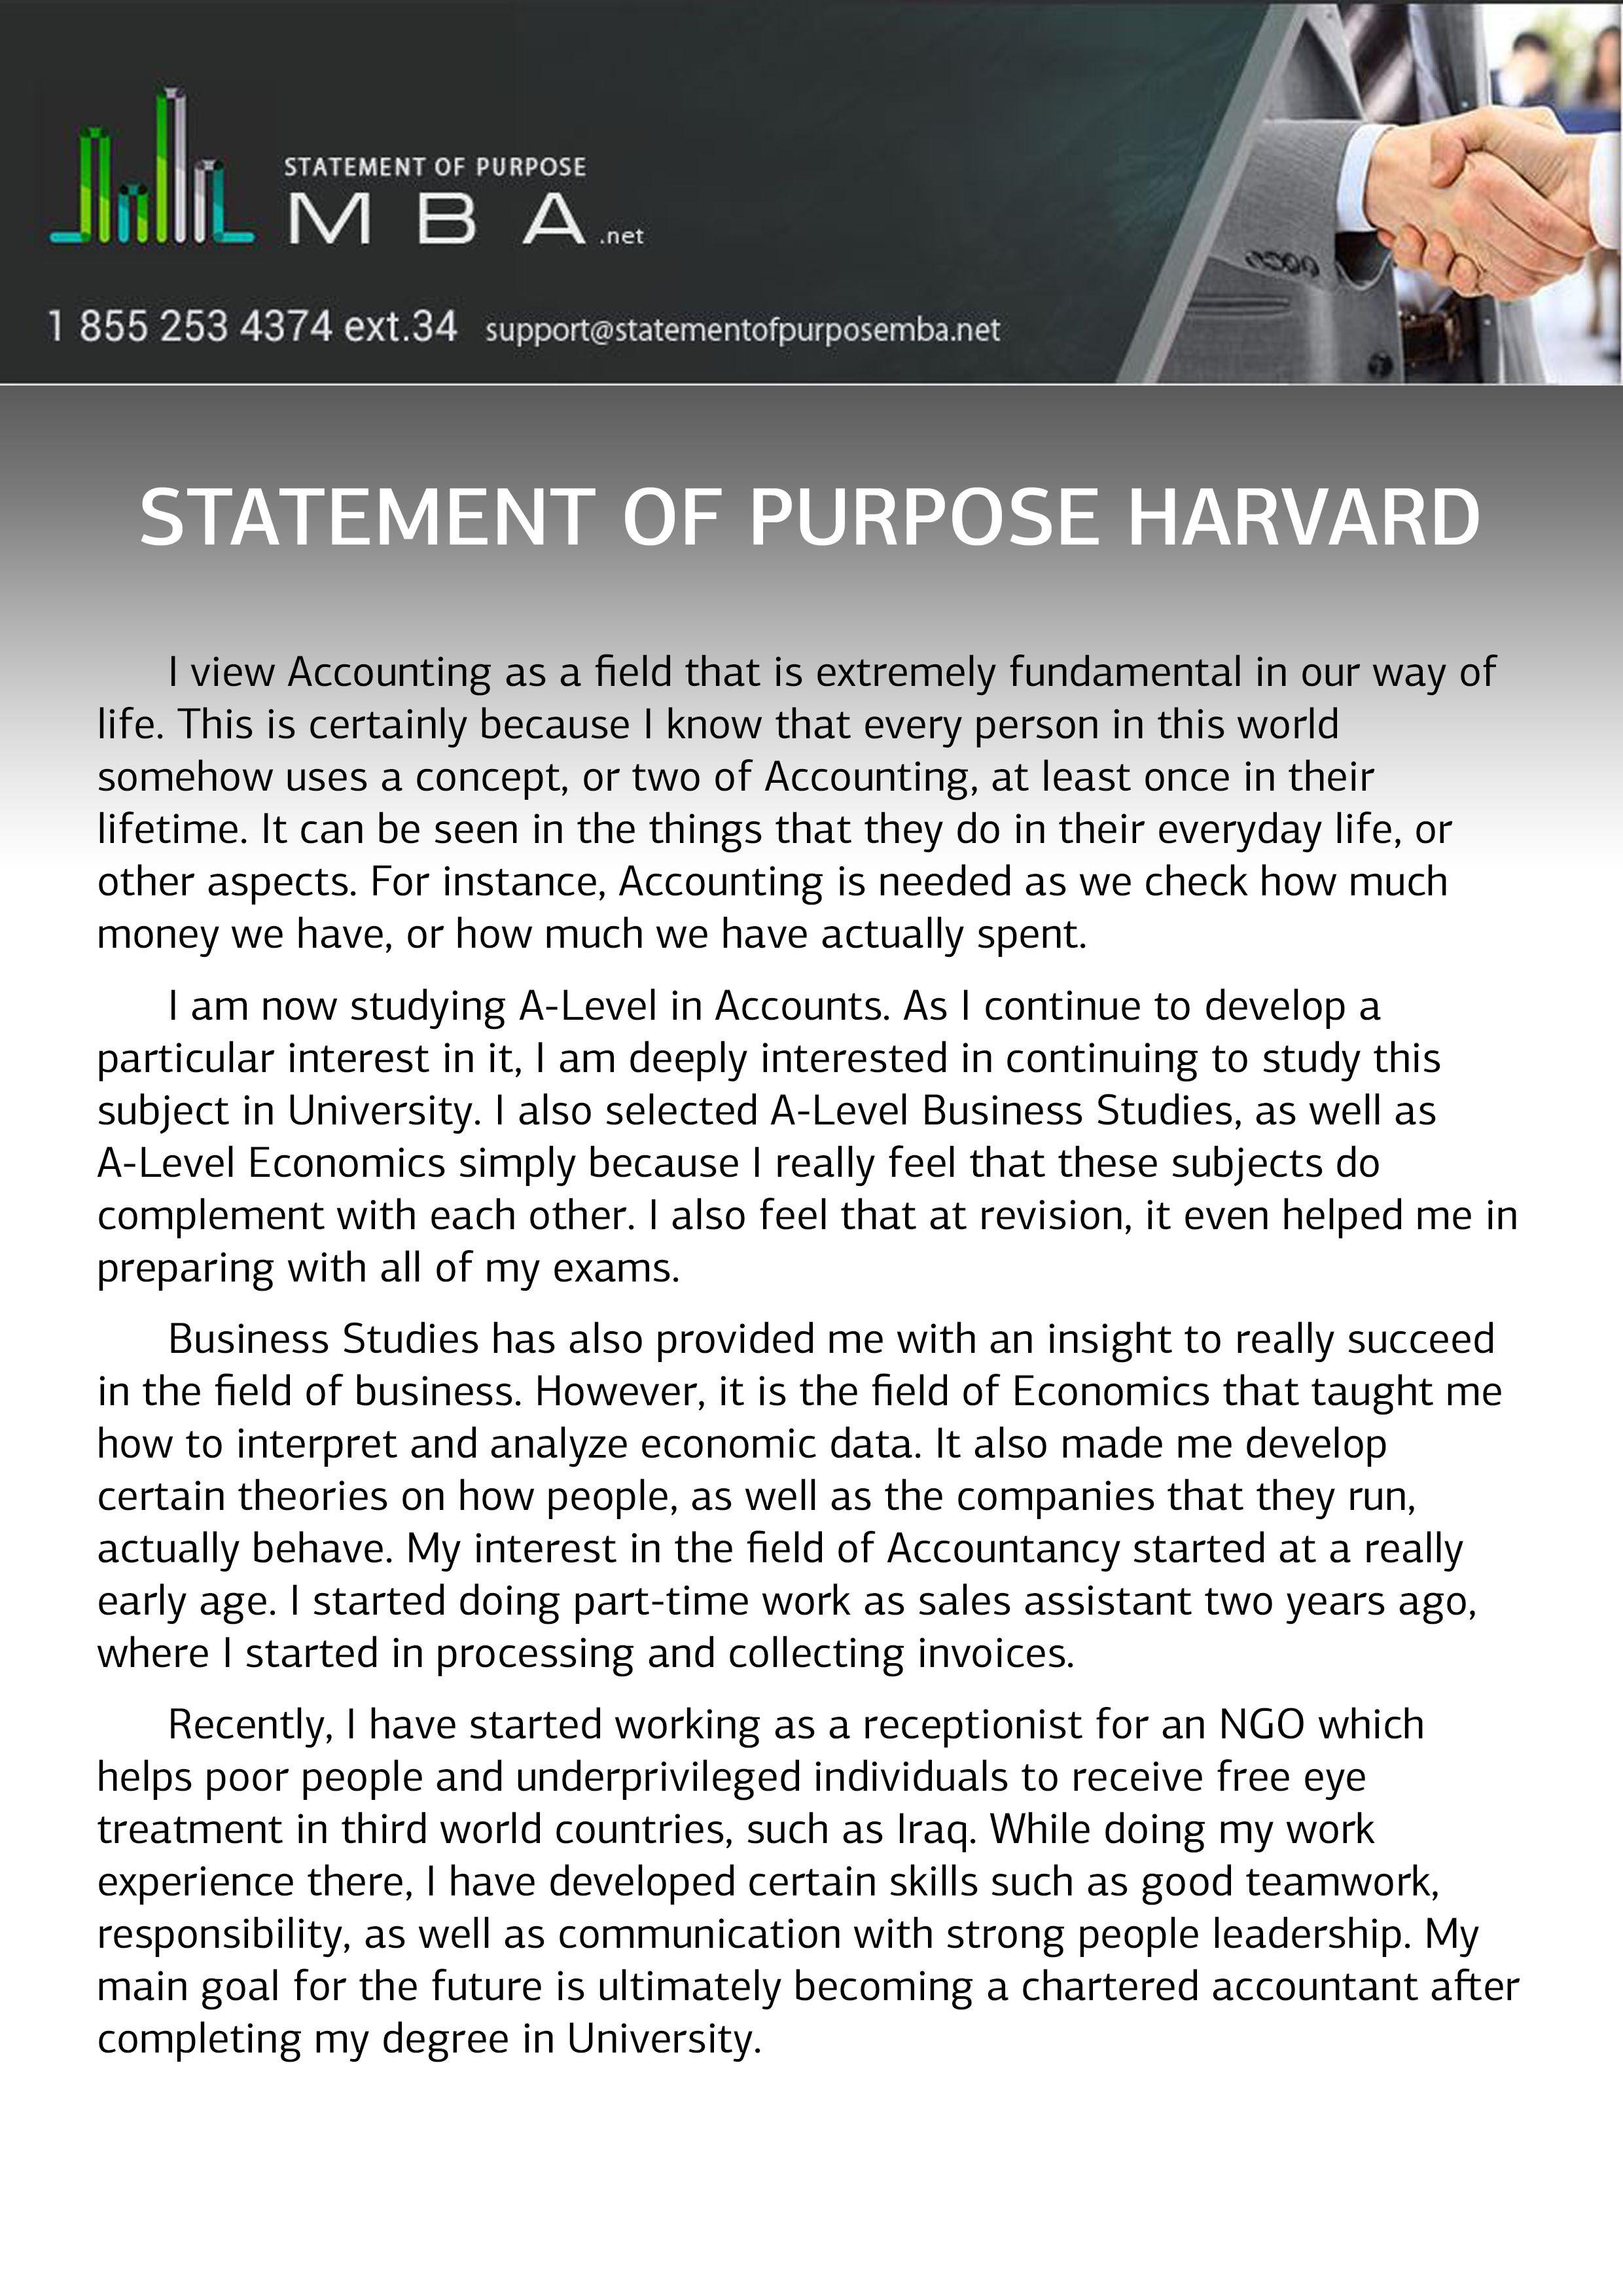 012 Essay Example Mit Application Stirring Essays 2017 Best College Full